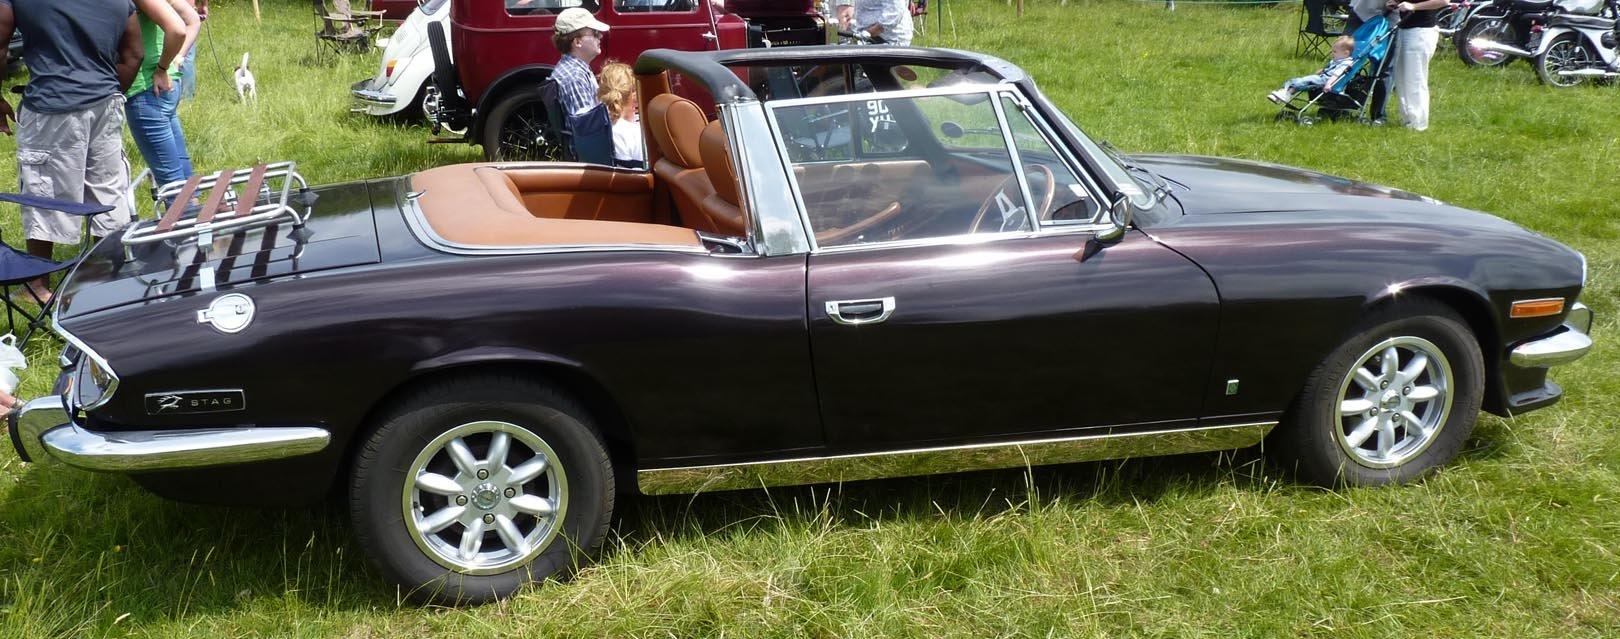 1972 Mk1/2 Triumph stag SOLD (picture 6 of 6)